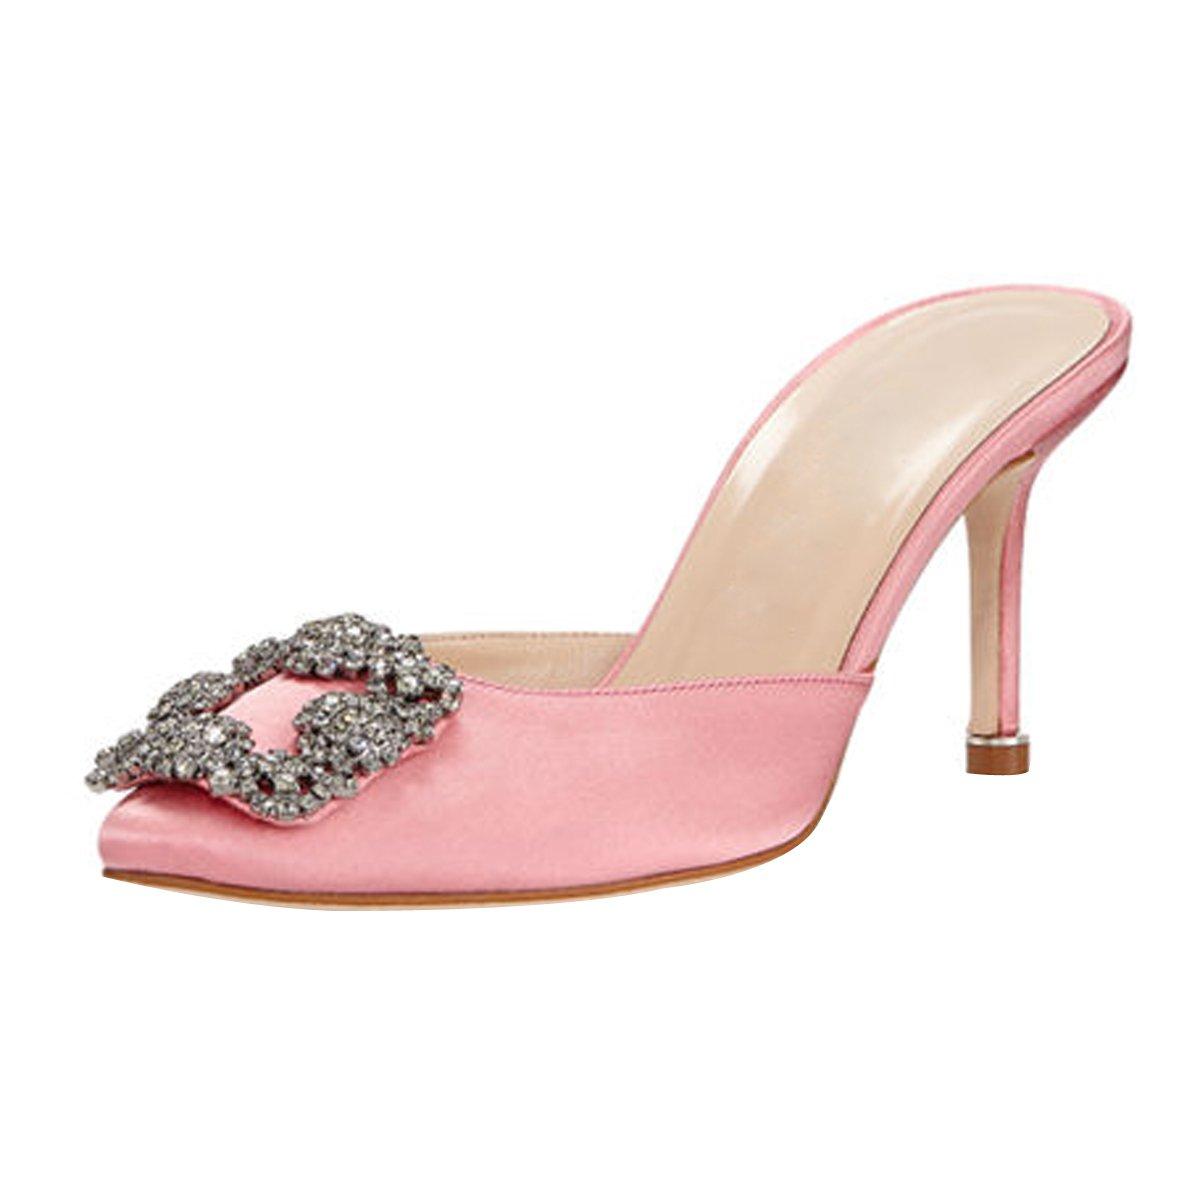 Mavirs Women's Satin Pointy Toe Slide Sandals Rhinestones Kitten Heels Pumps Jeweled Slingback Heeled Mules Shoes 8.5 M US